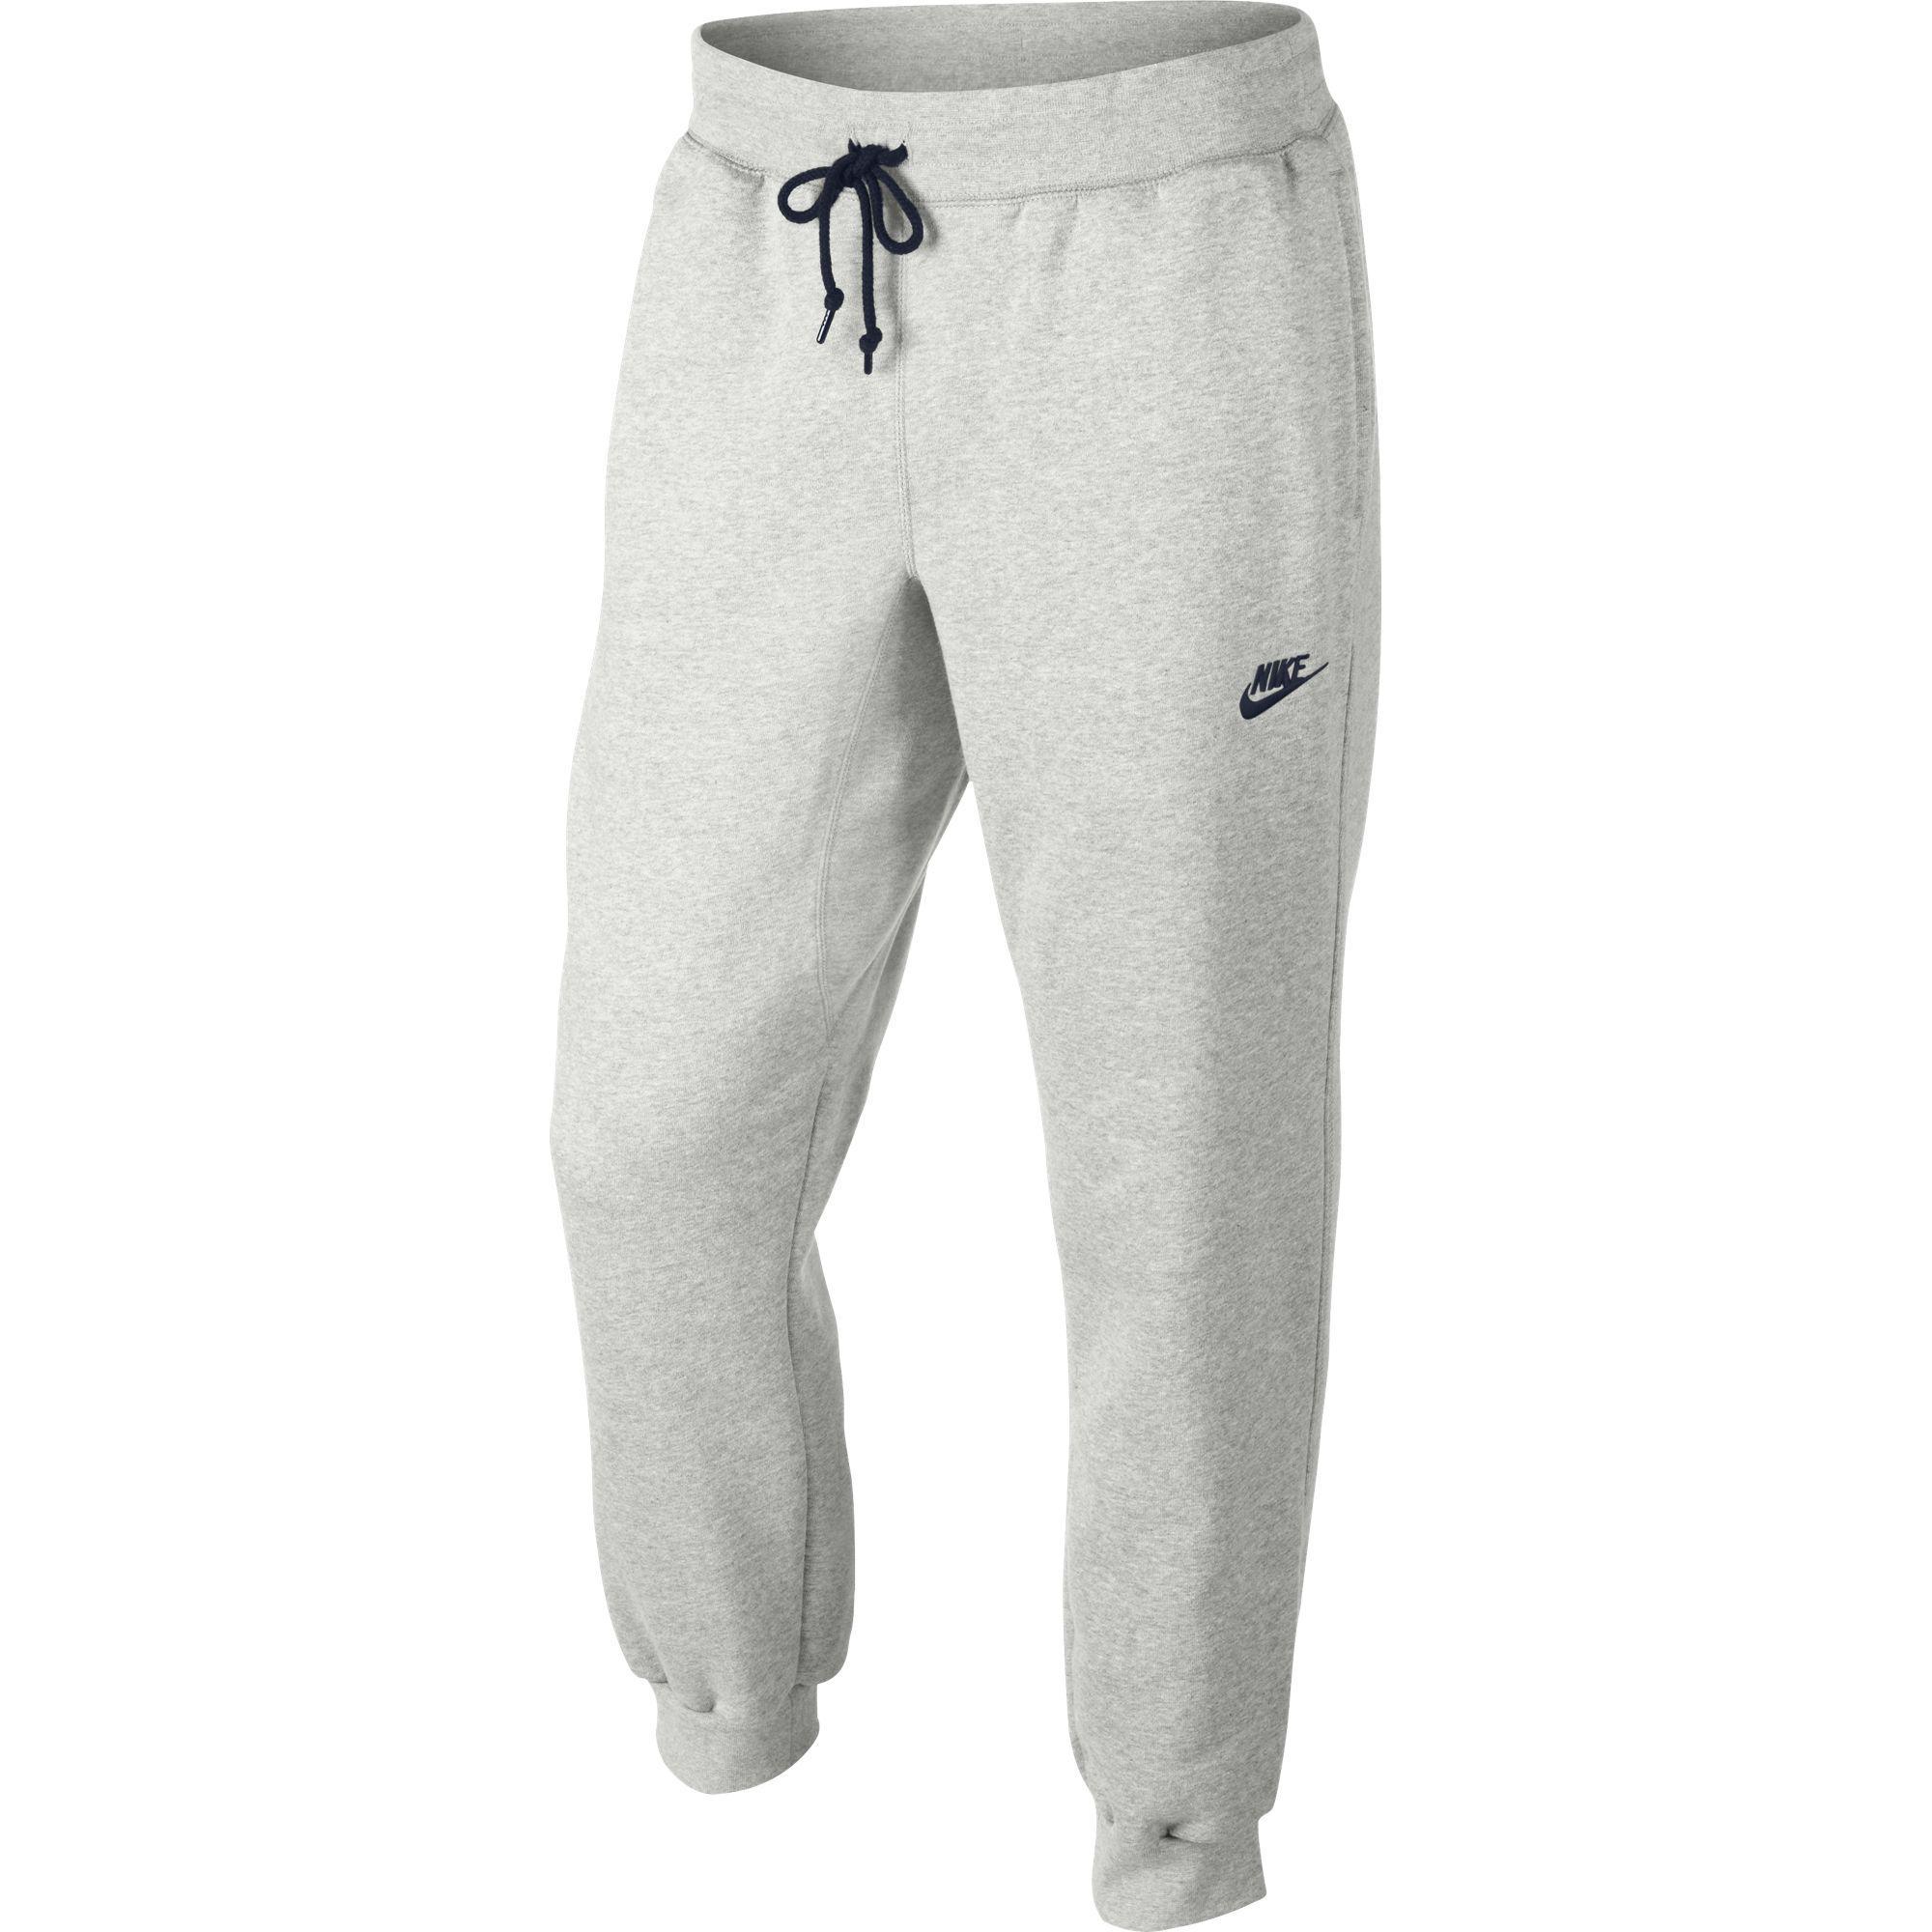 b942c9ac25 Nike Mens AW77 Cuffed Fleece Trousers - Birch Heather